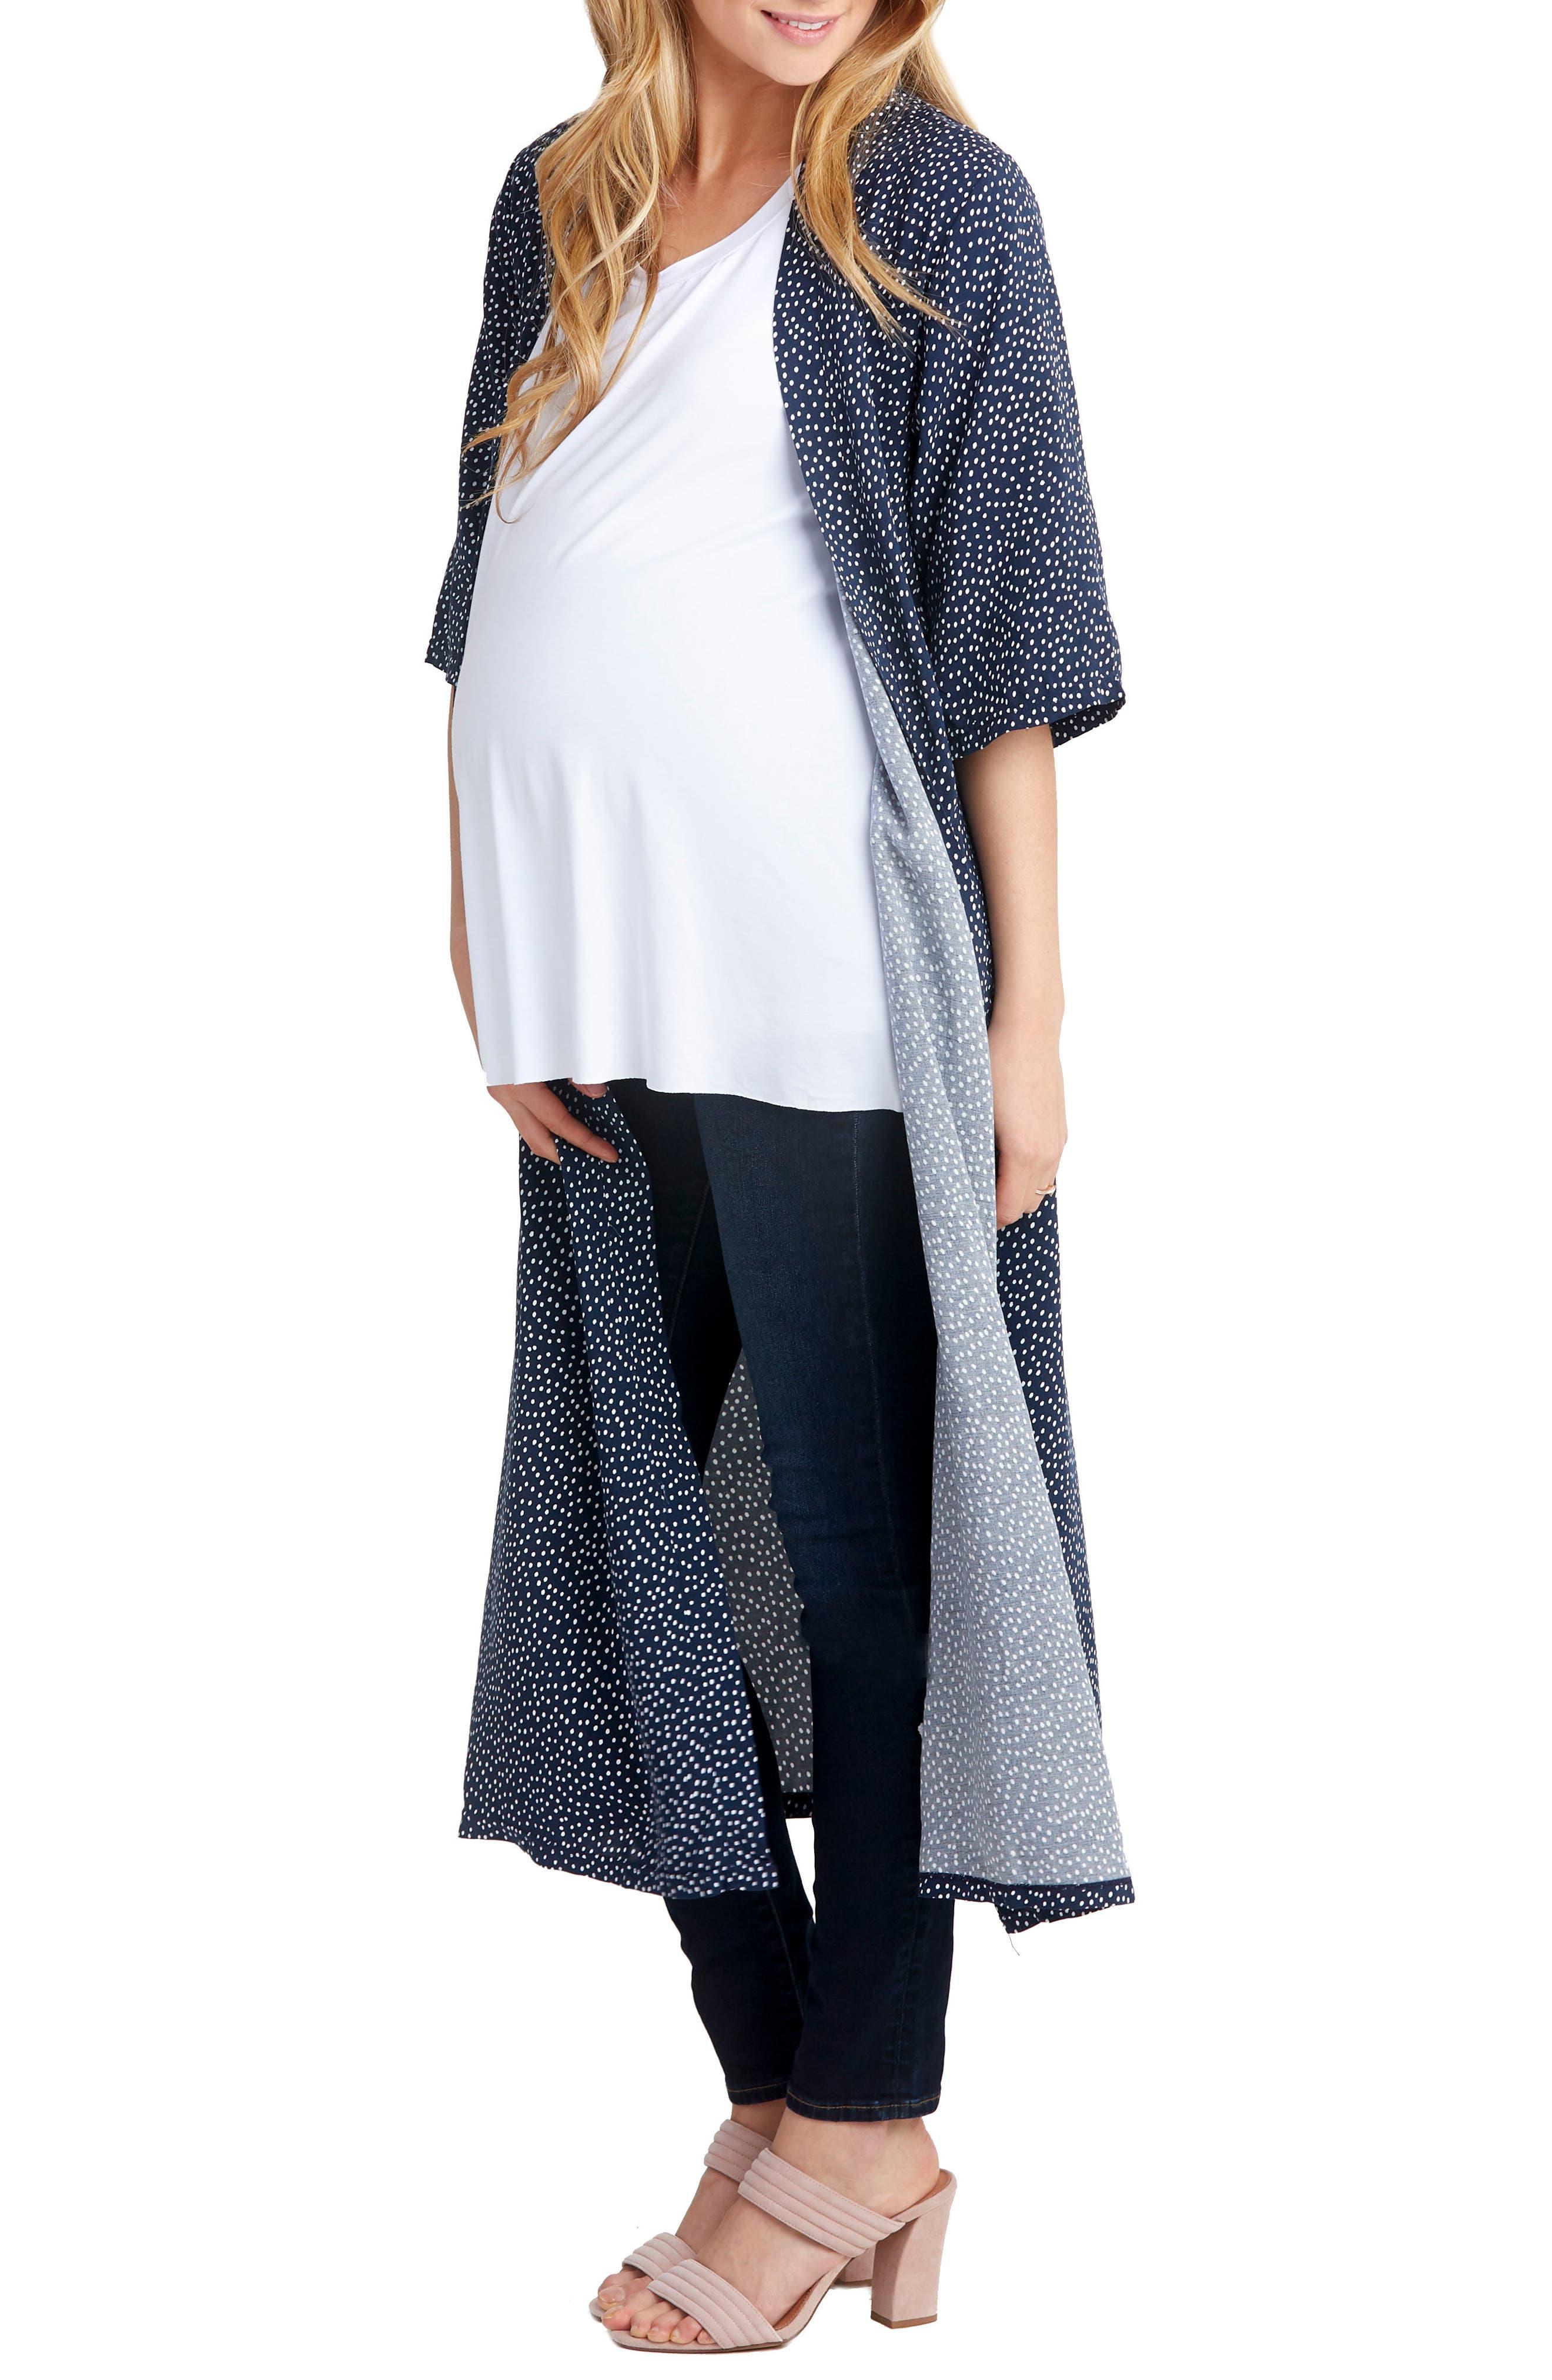 Draper Maternity Robe,                             Alternate thumbnail 3, color,                             400